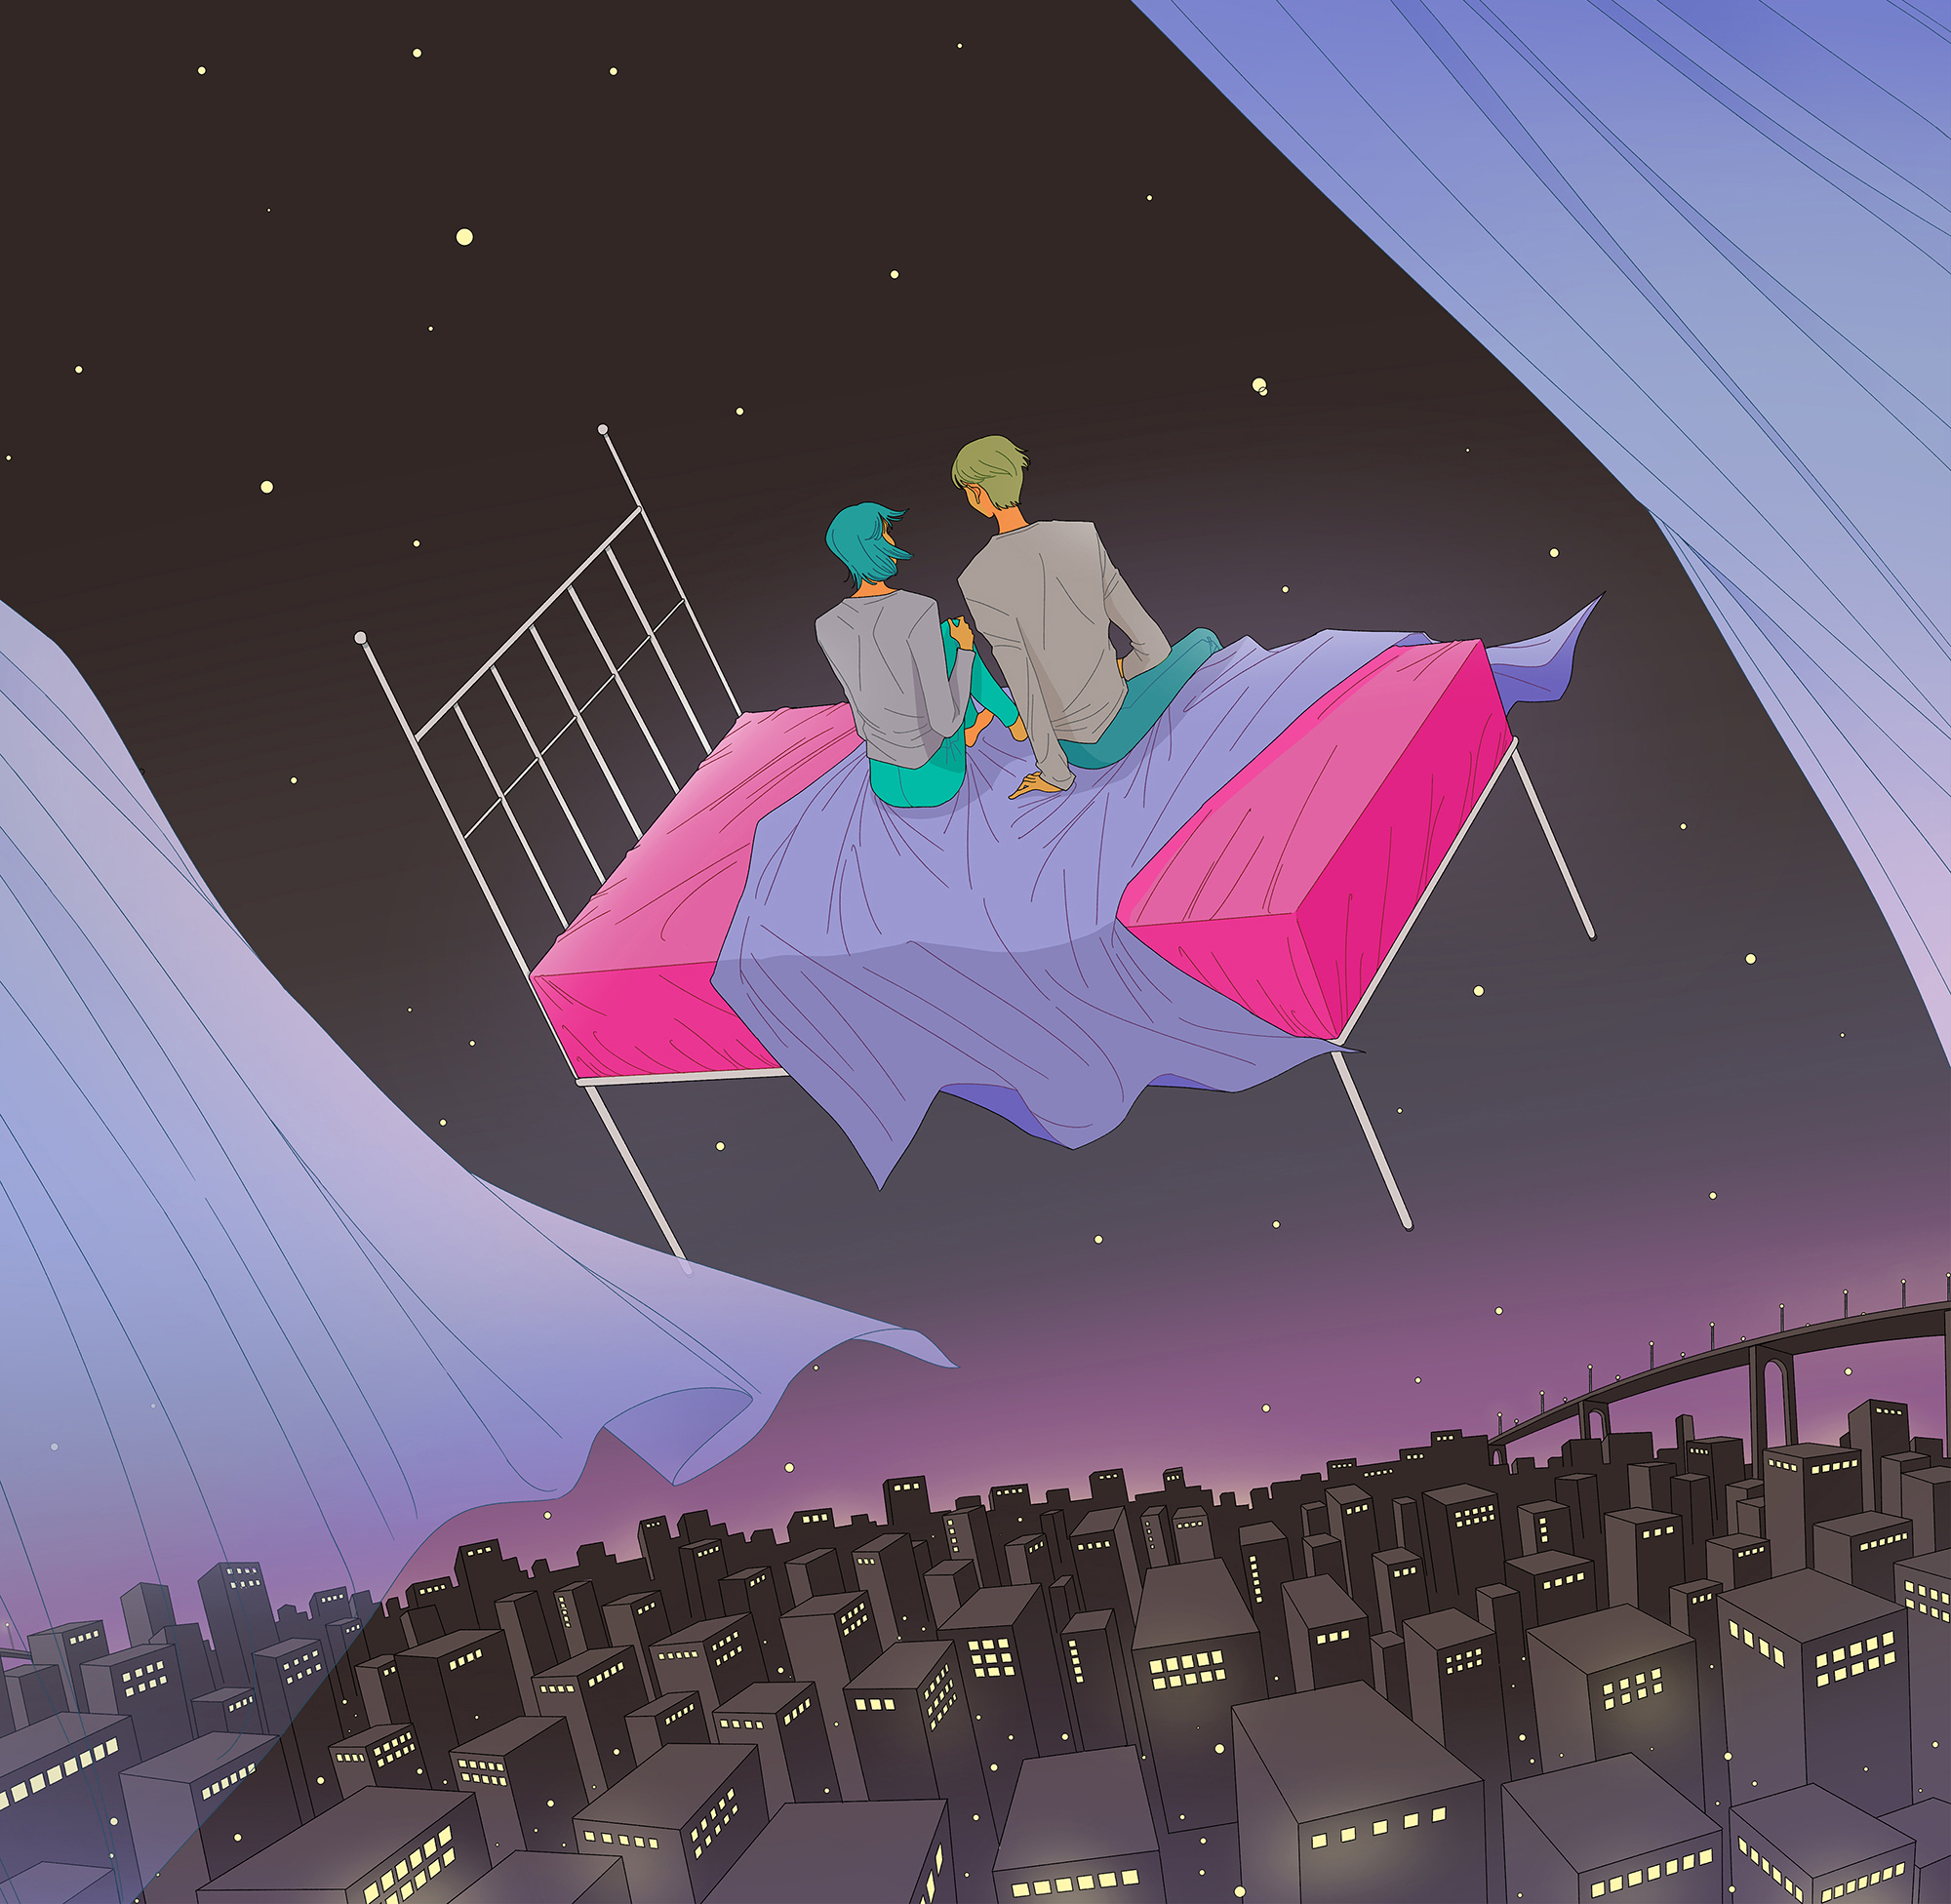 GirlsclubAsia-Illustrator-Seoyoung-tototatatu-3